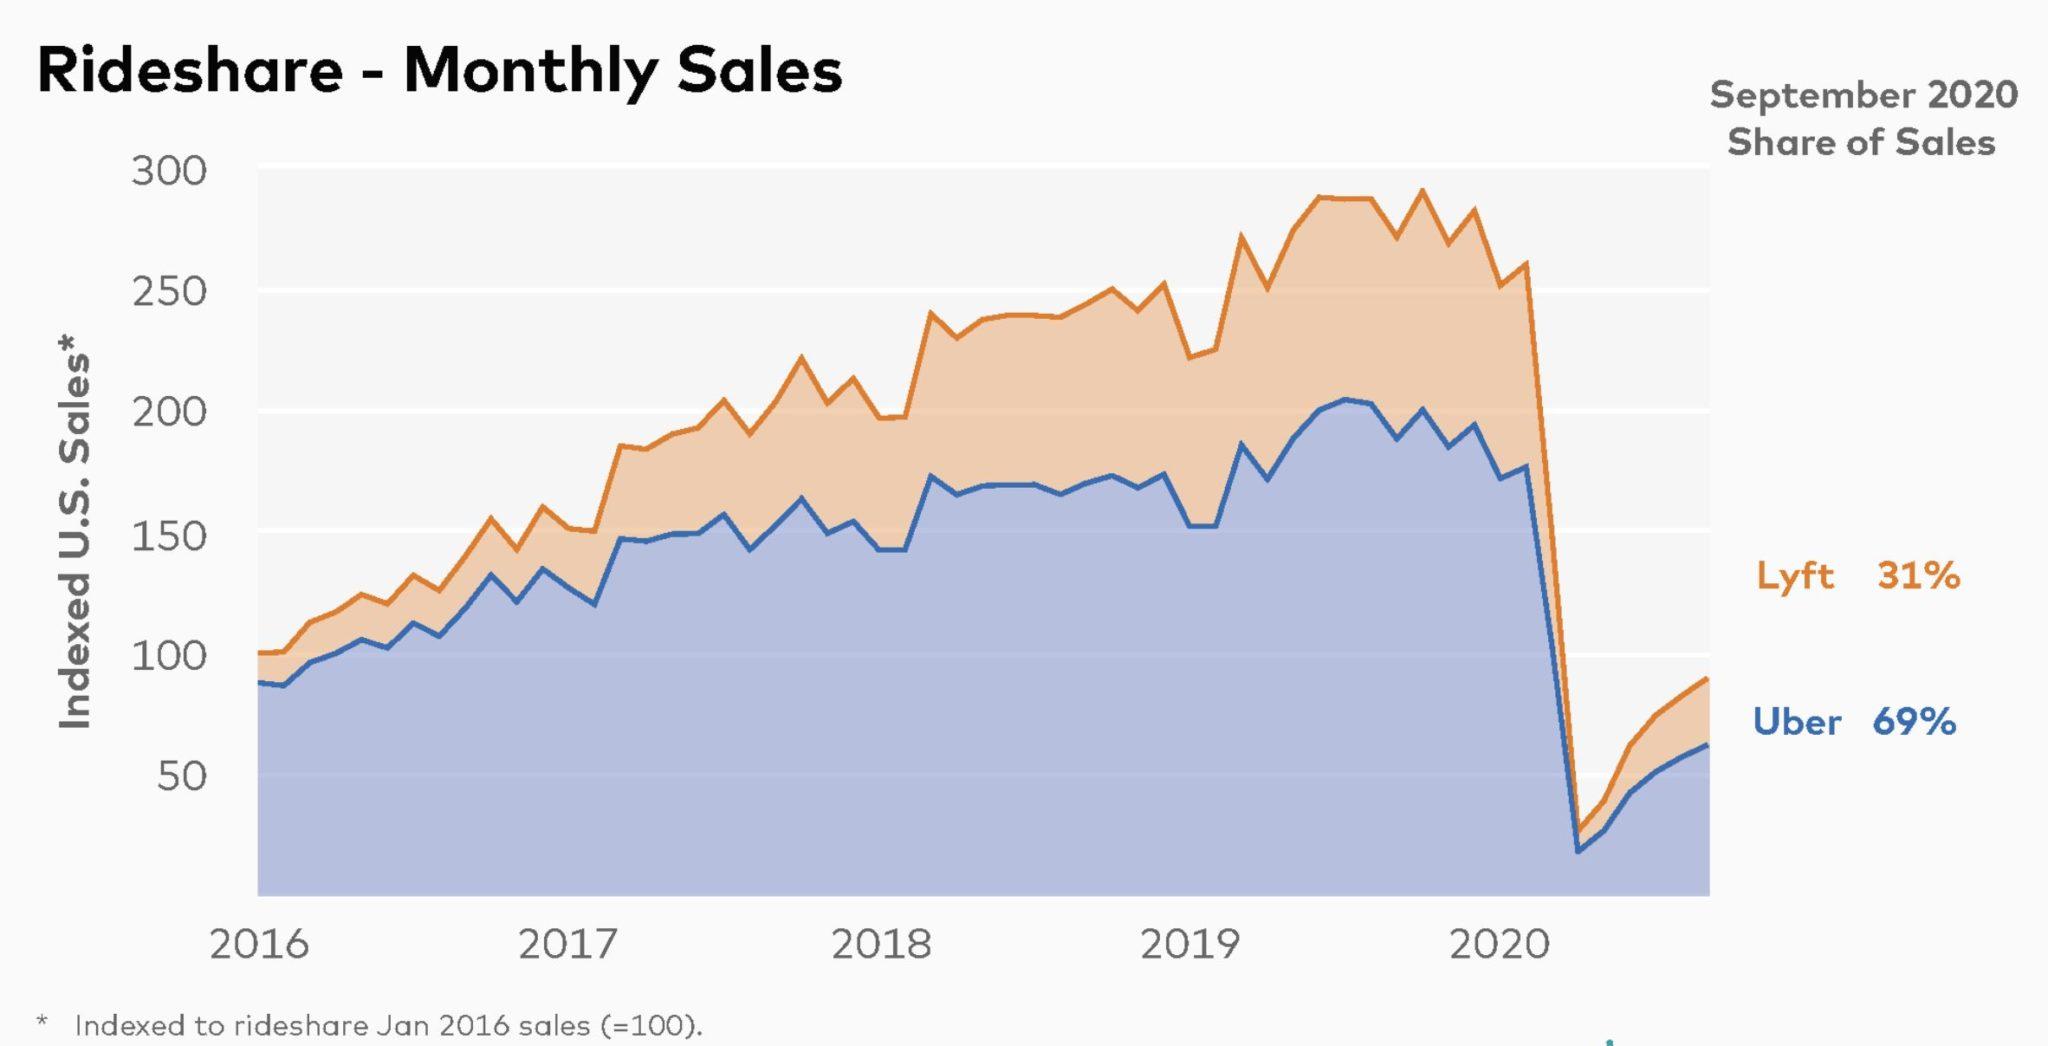 Lyft vs Uber Monthly Sales in the US